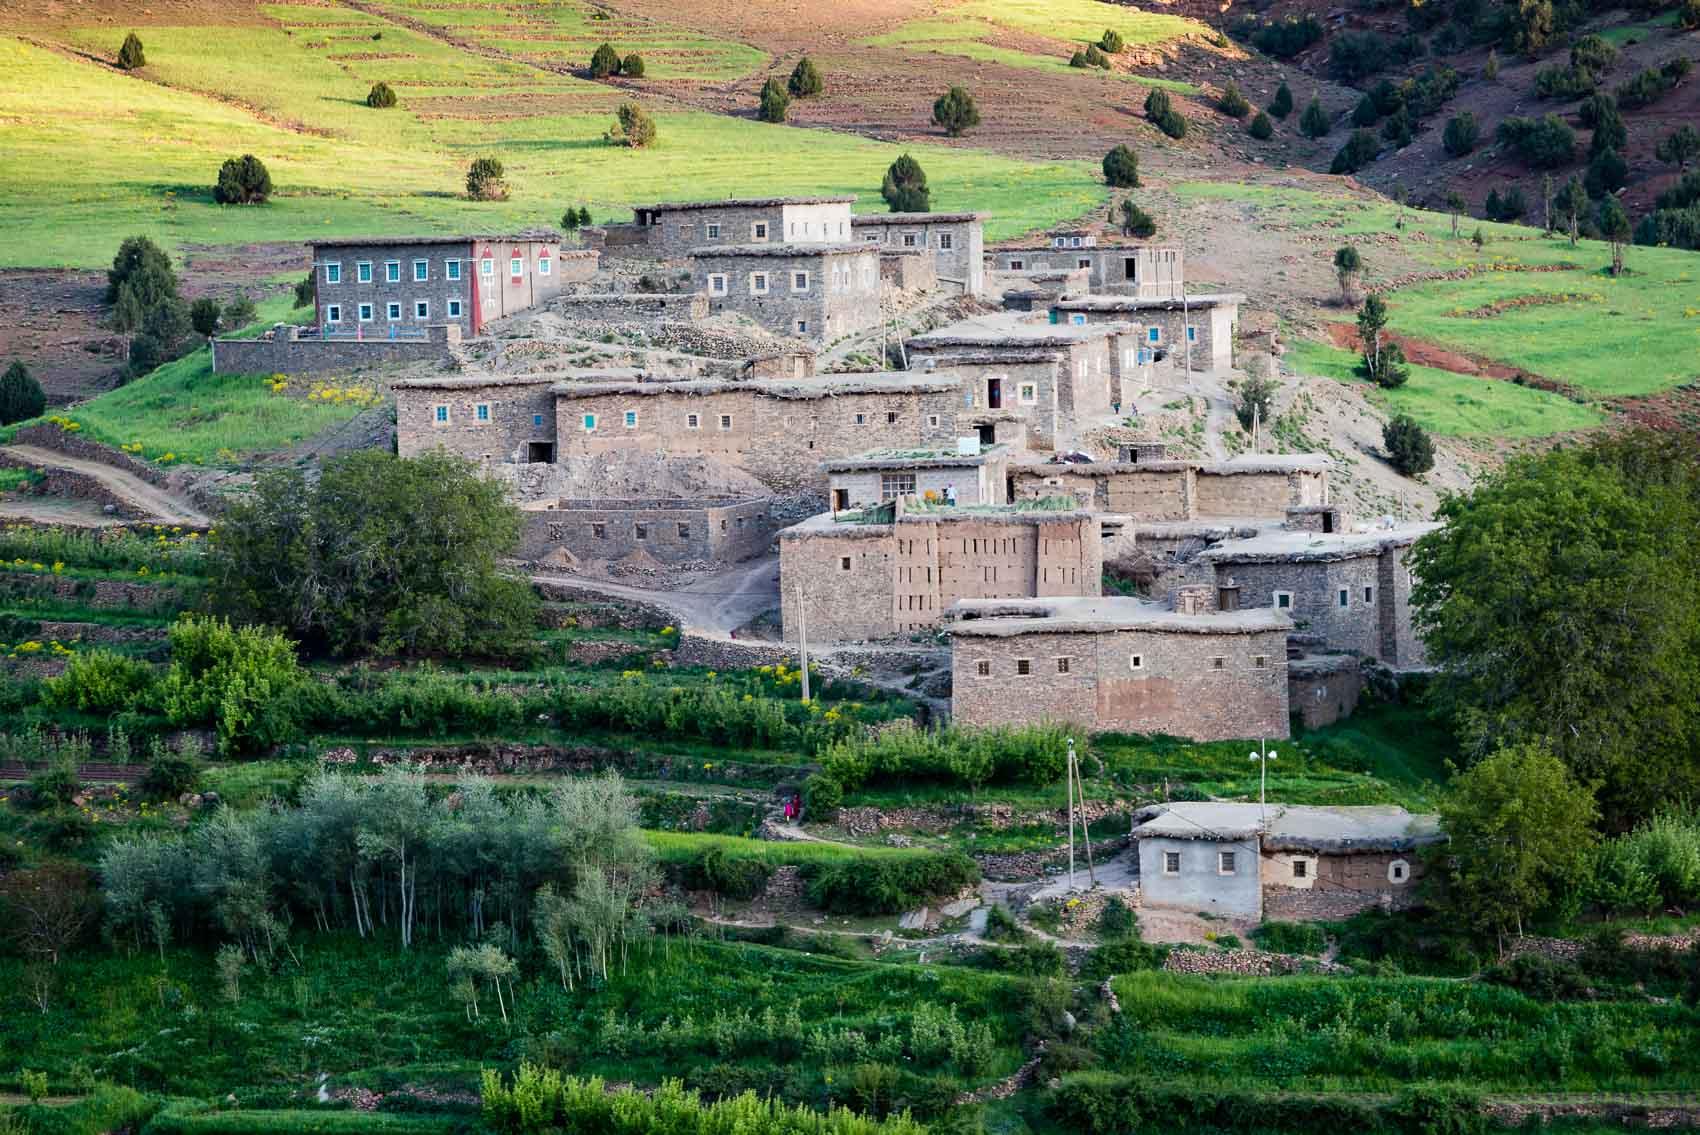 Ait Bougmez - The happy valley